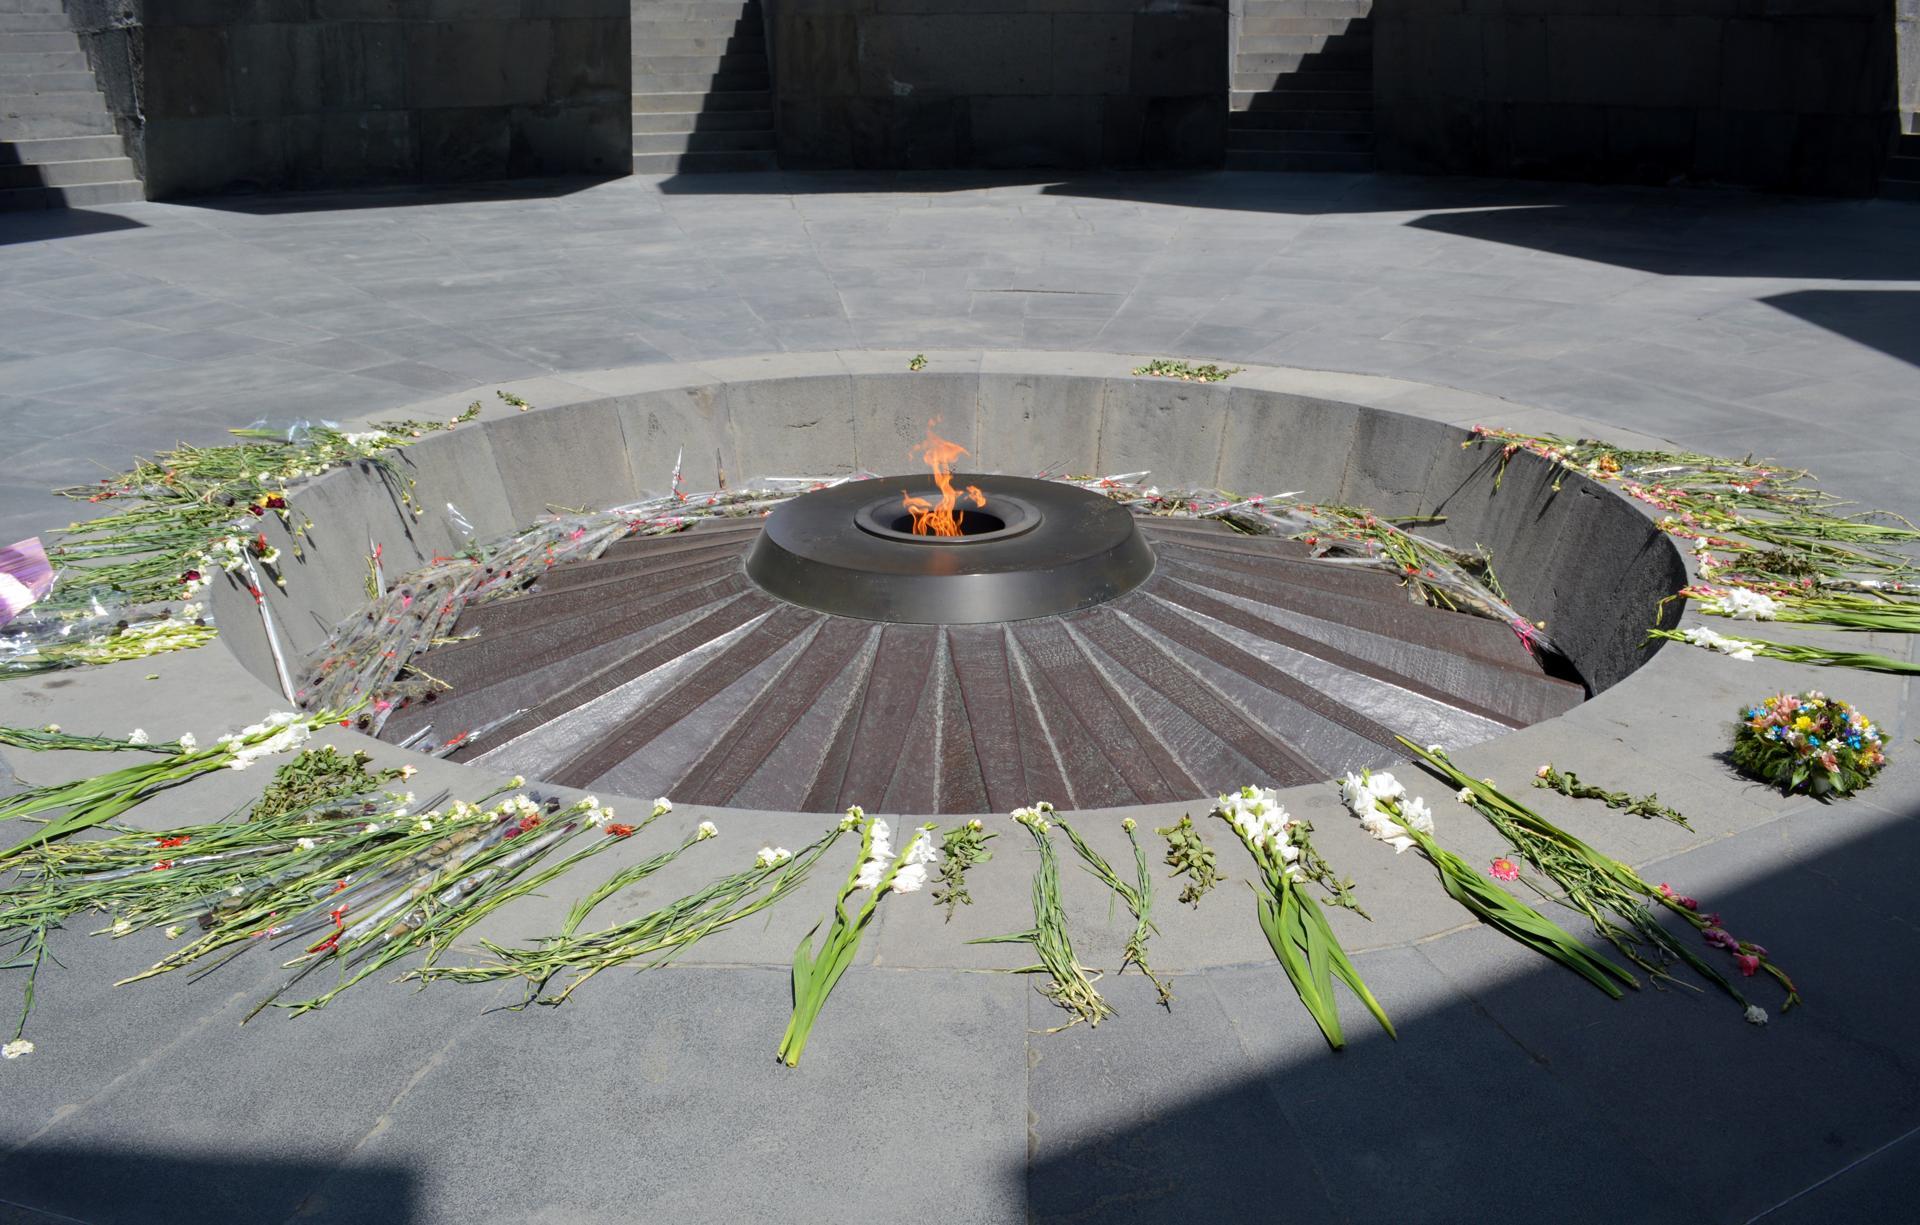 29armenia - Eternal flame. (Juliet Pennington for The Boston Globe)